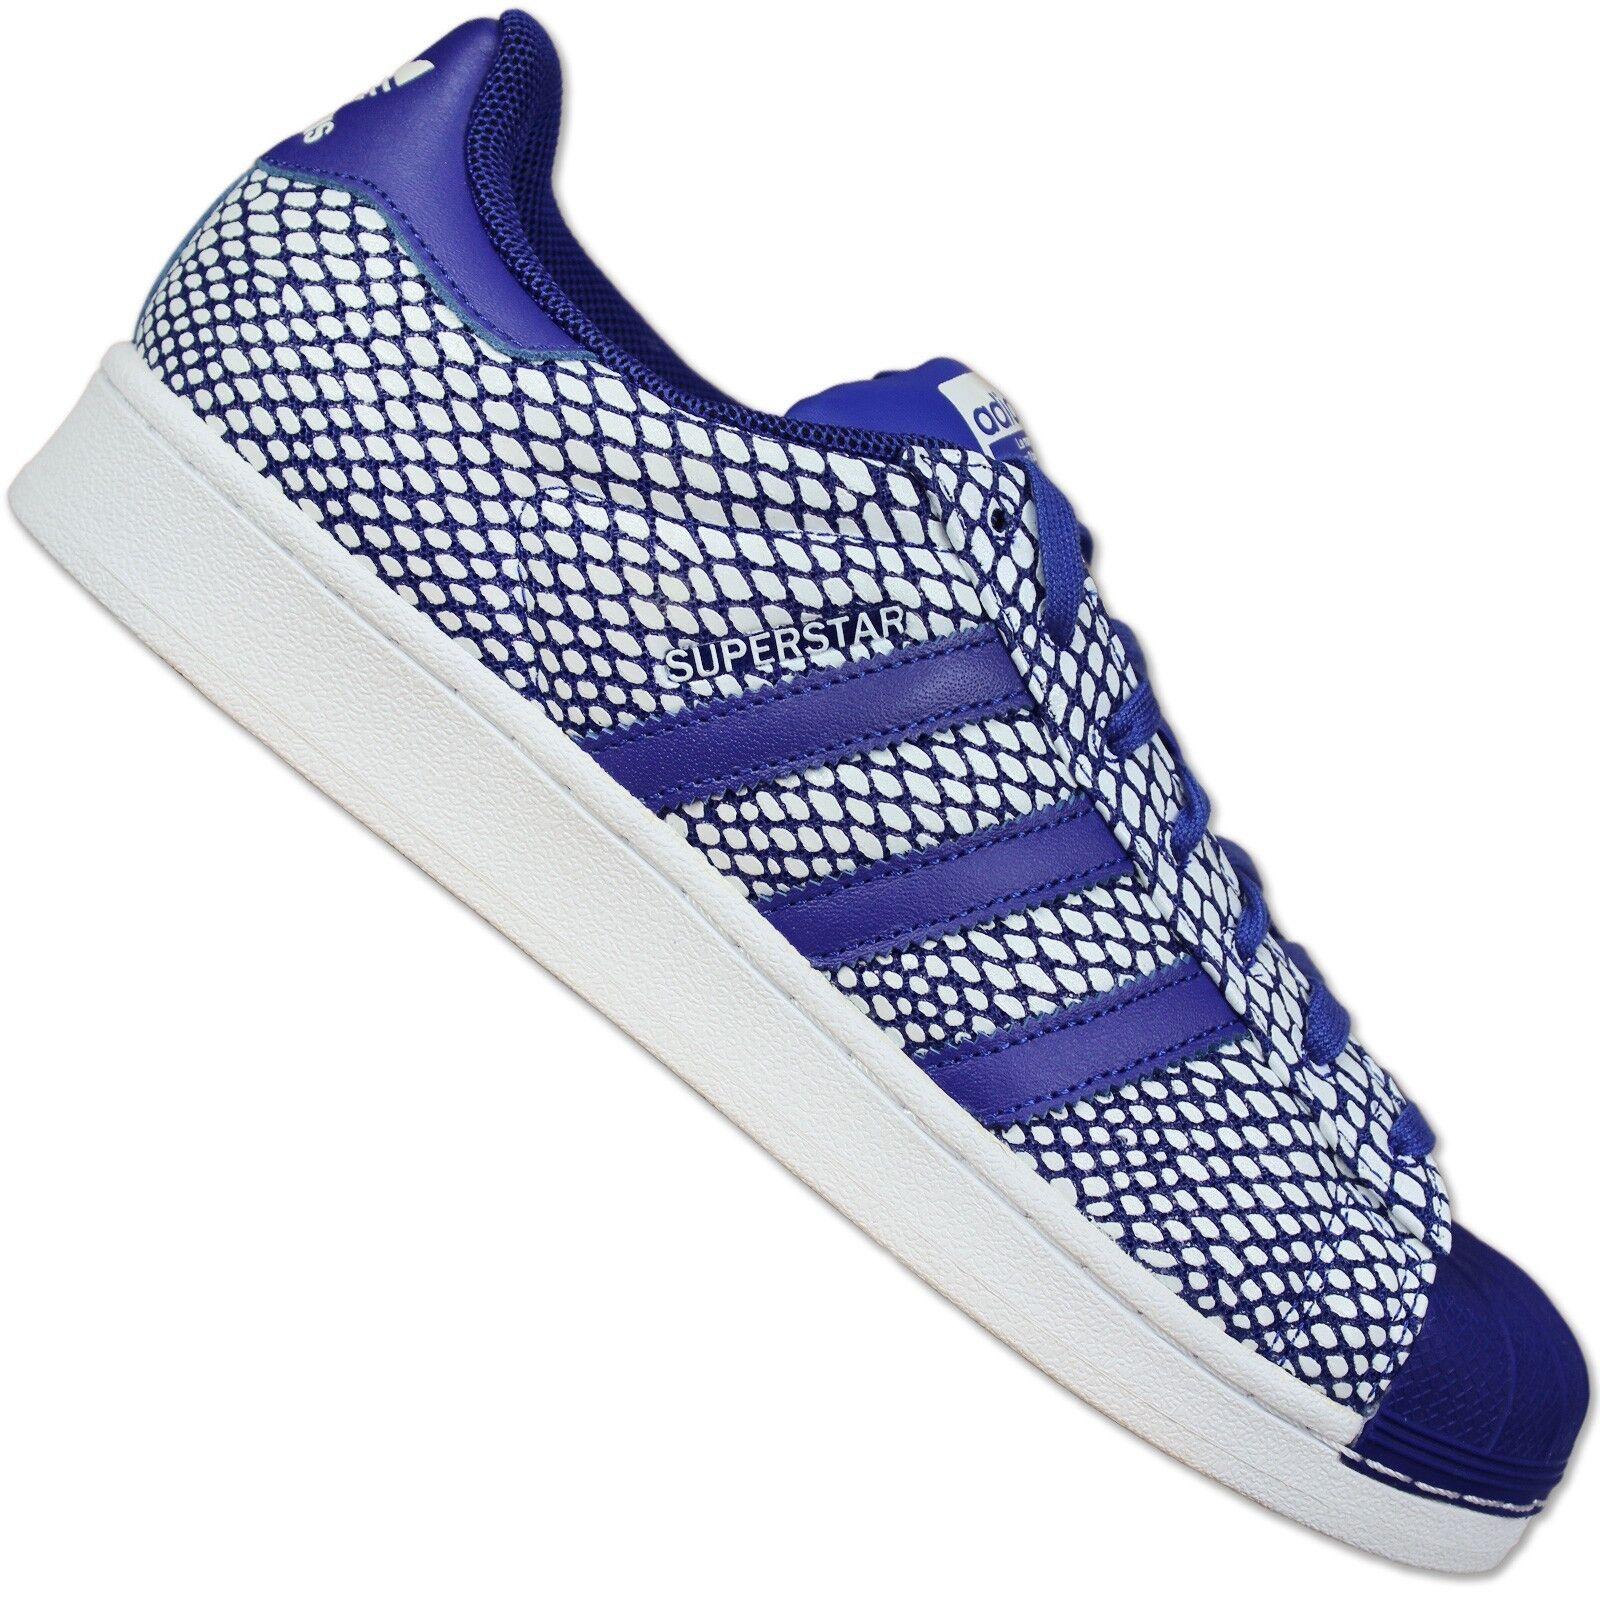 ADIDAS ORIGINALS cortos superstar 80s Snake Pack Cuero cortos ORIGINALS zapatos s82729 azul 49b04f